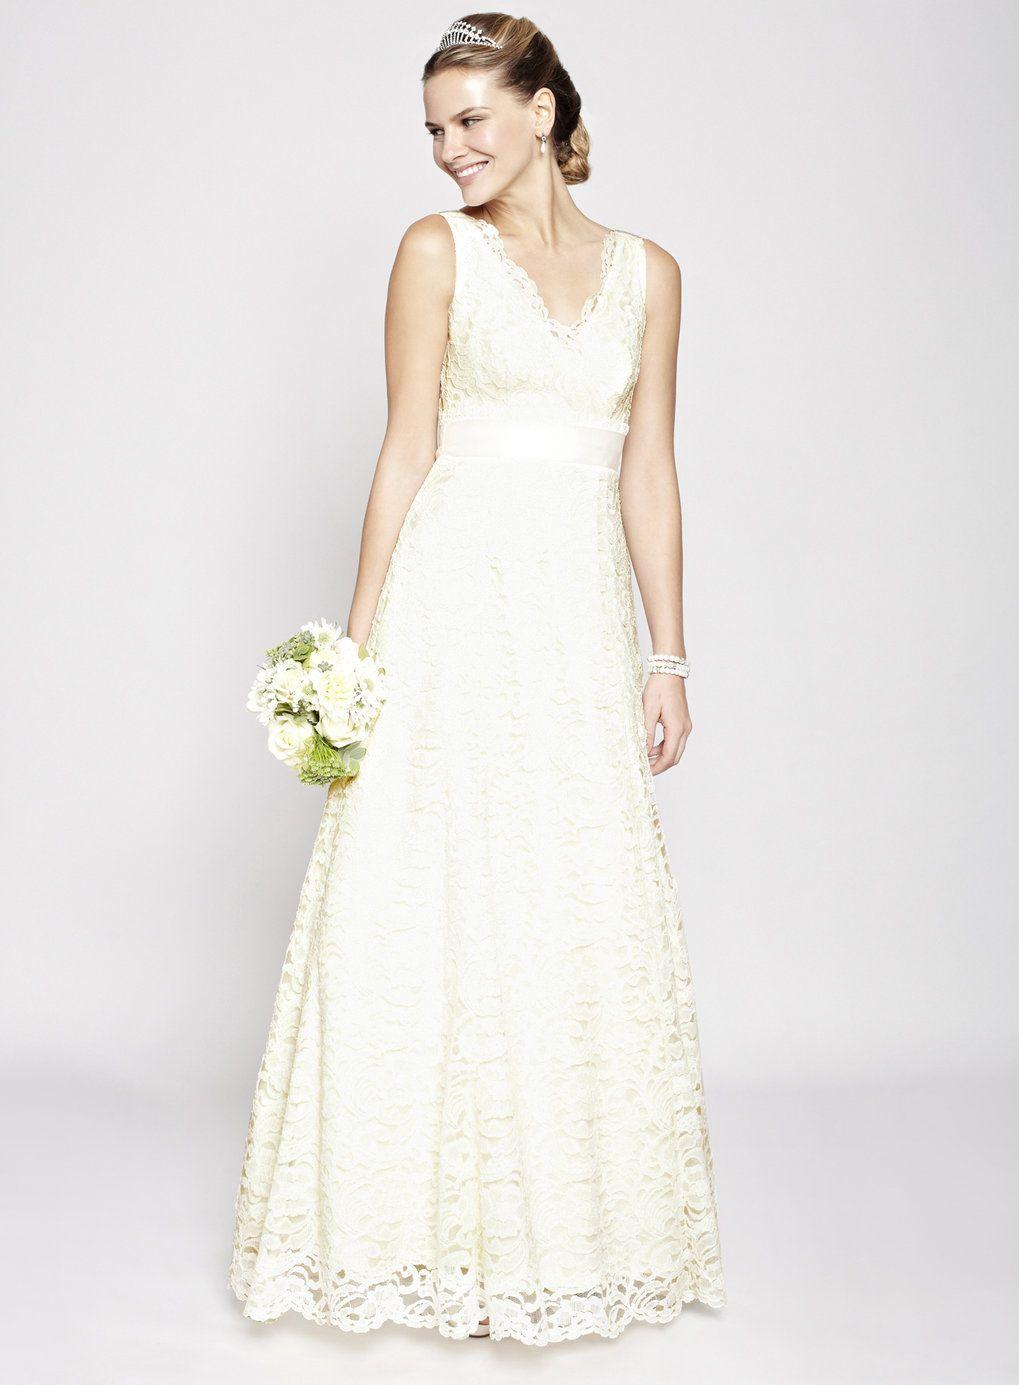 Ivory Bella Lace Wedding Dress Wedding Dresses Maxi Dress Wedding Wedding Dresses Lace